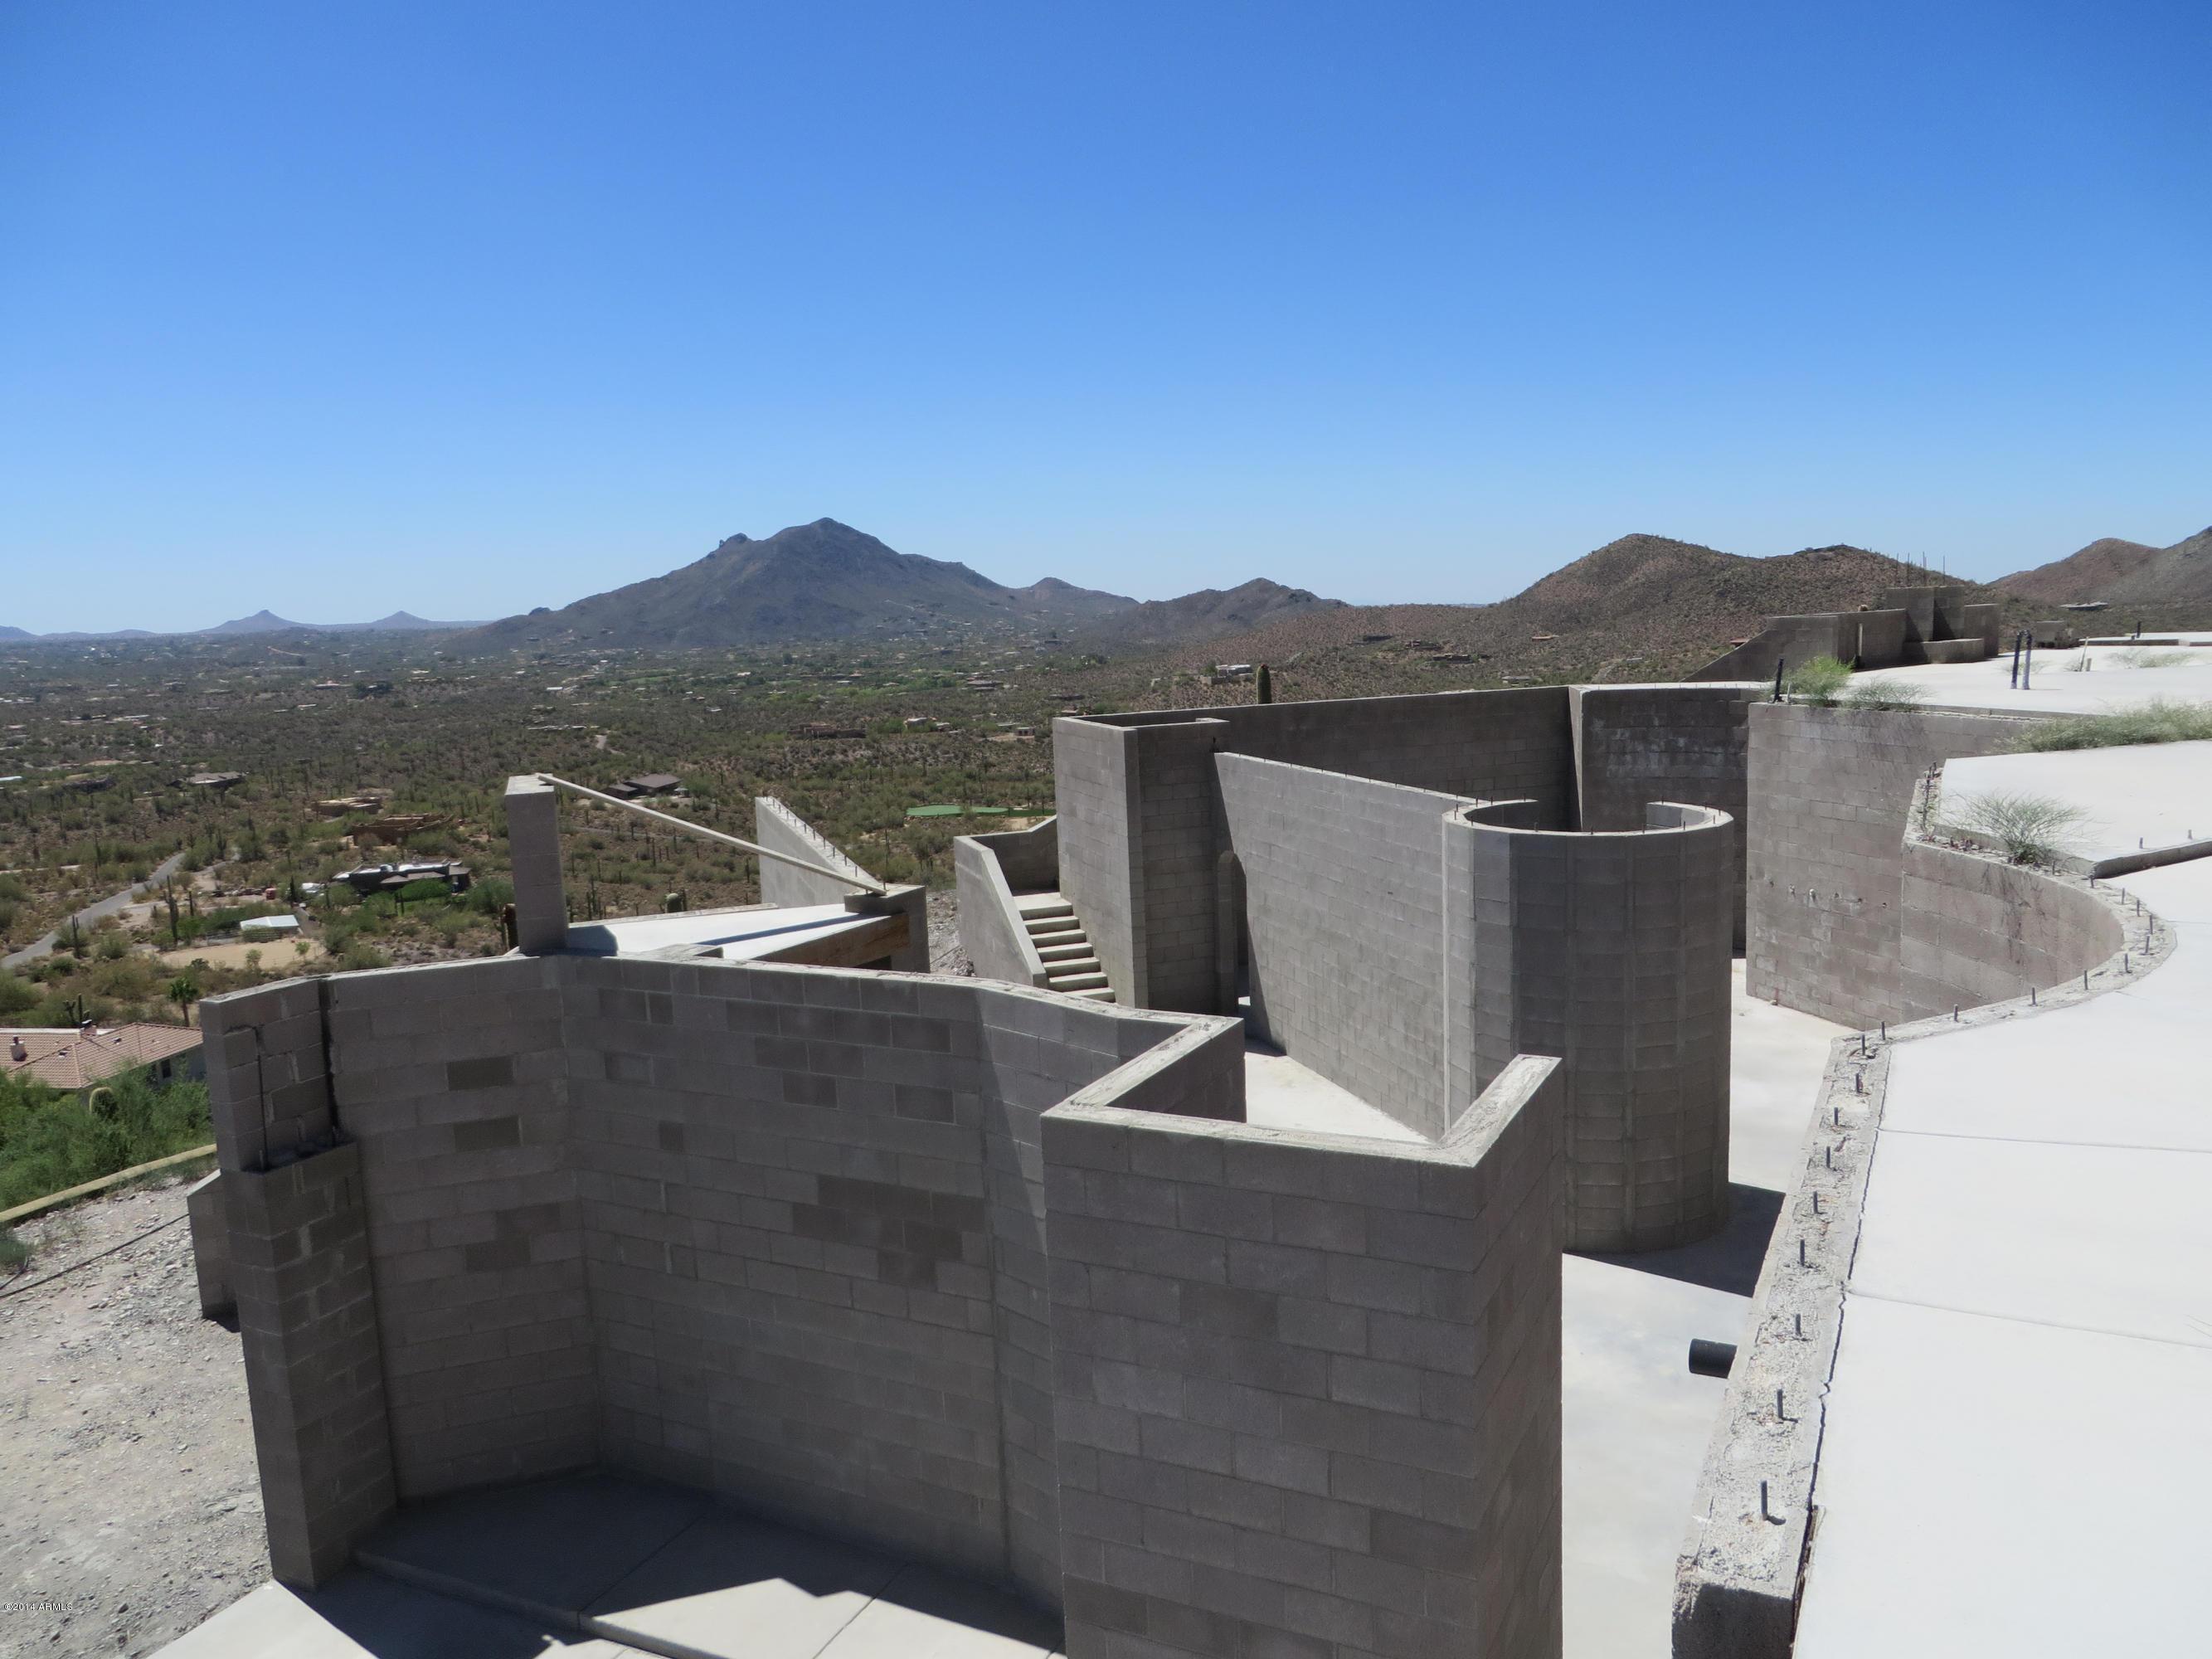 MLS 5527999 4880 E LONE MOUNTAIN Road, Cave Creek, AZ 85331 Cave Creek AZ Spec Home